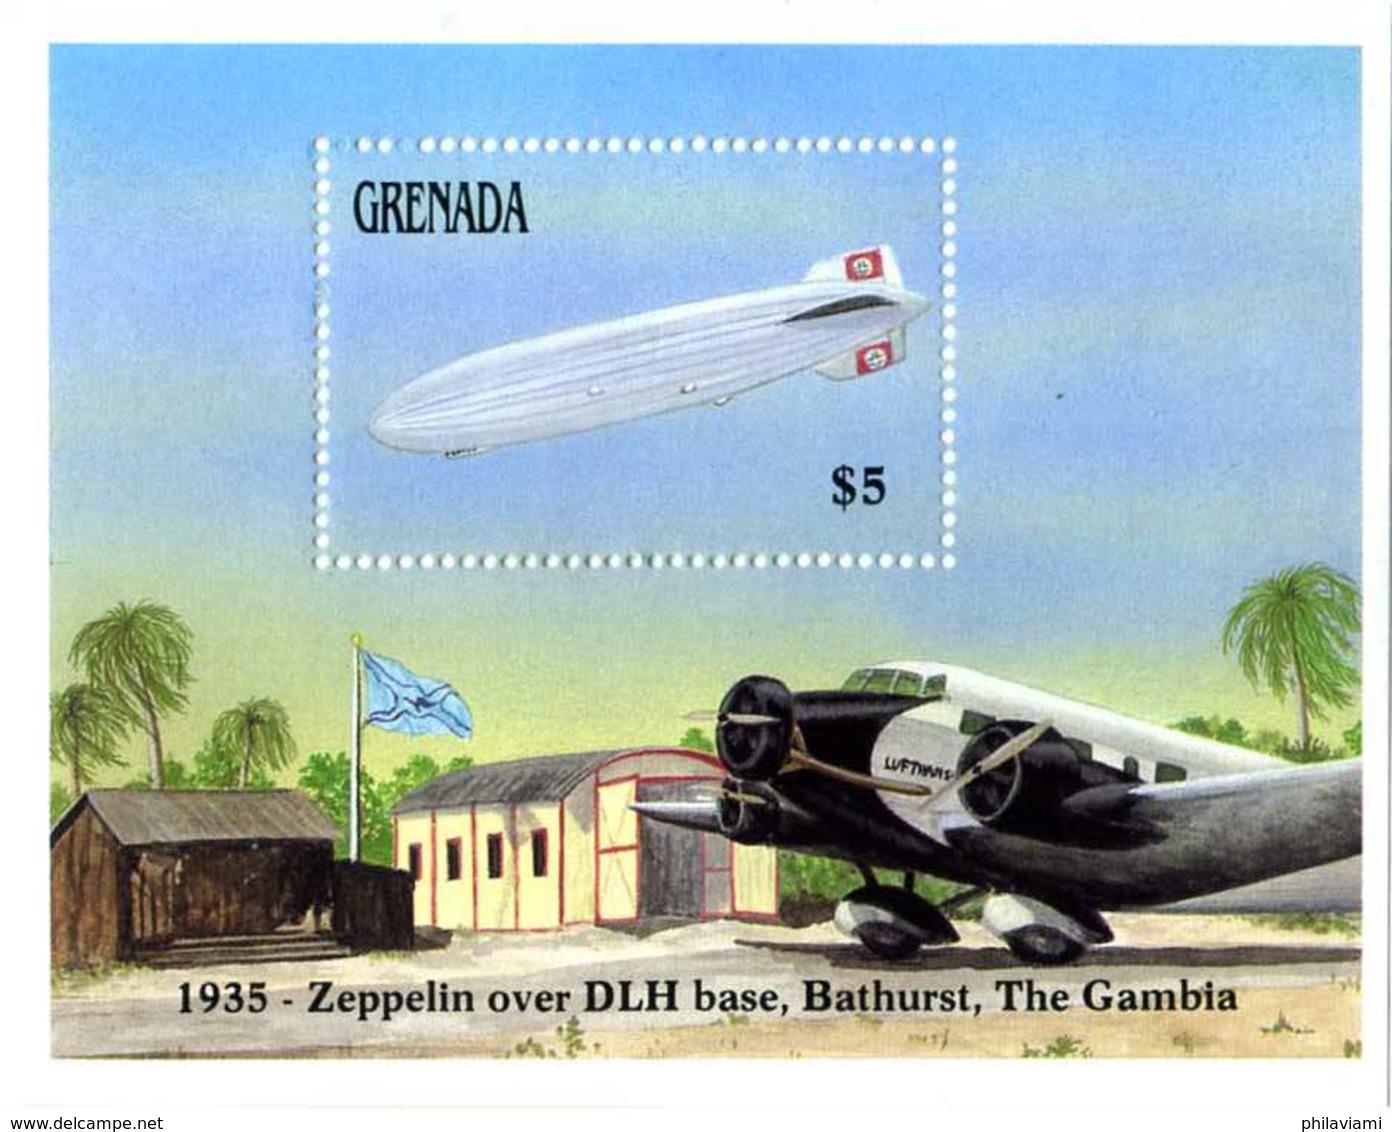 Grenade Grenada 1988 Zeppelin LZ-129 Hindenburg Station Bathurst - Zeppelins